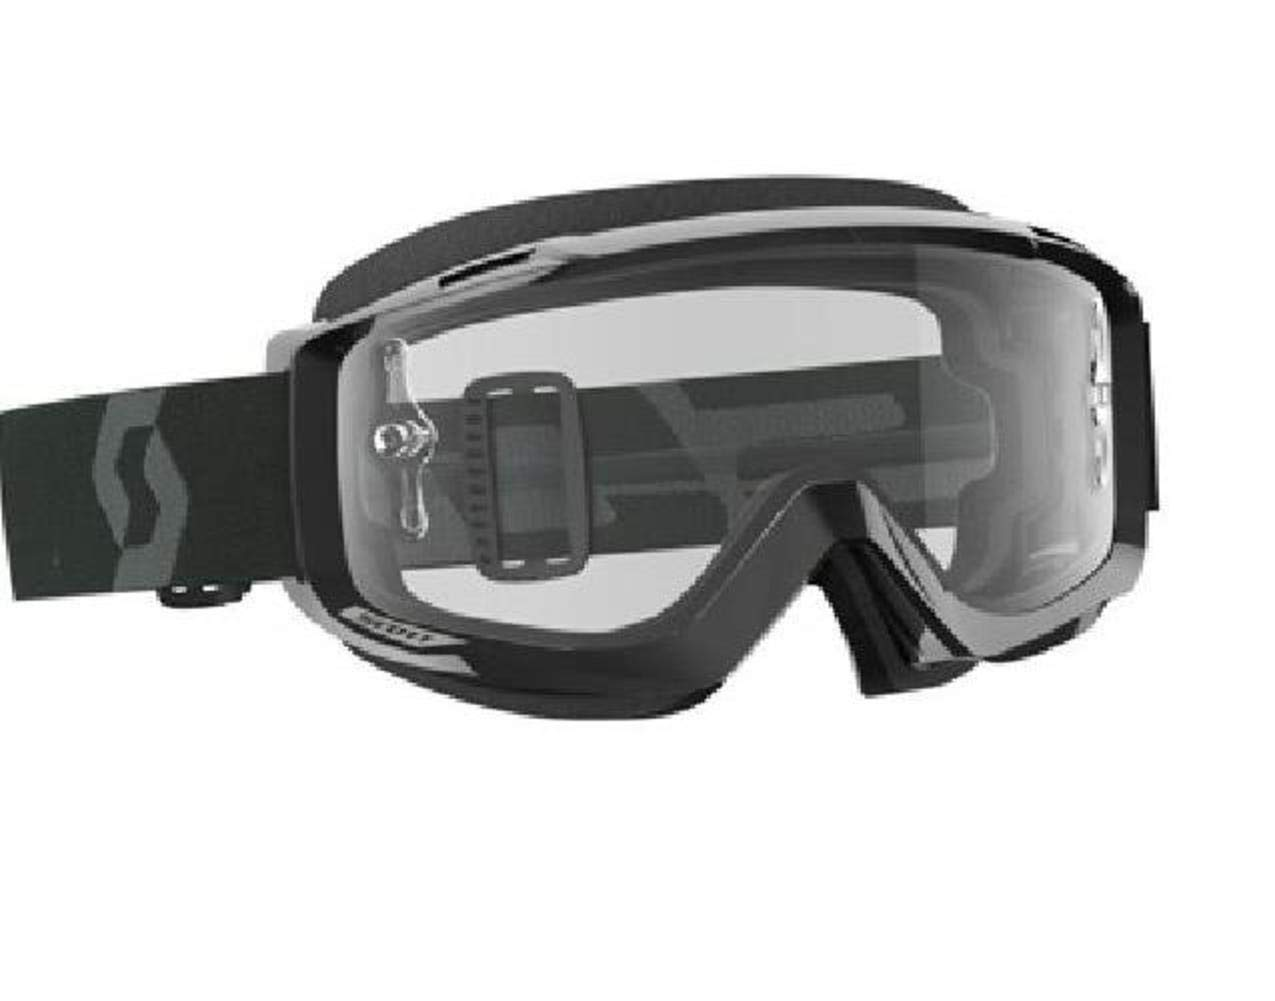 e13ed52e9ff Scott usa split otg goggles dirtrider off road gear reviews jpg 1275x1001 Scott  usa goggles